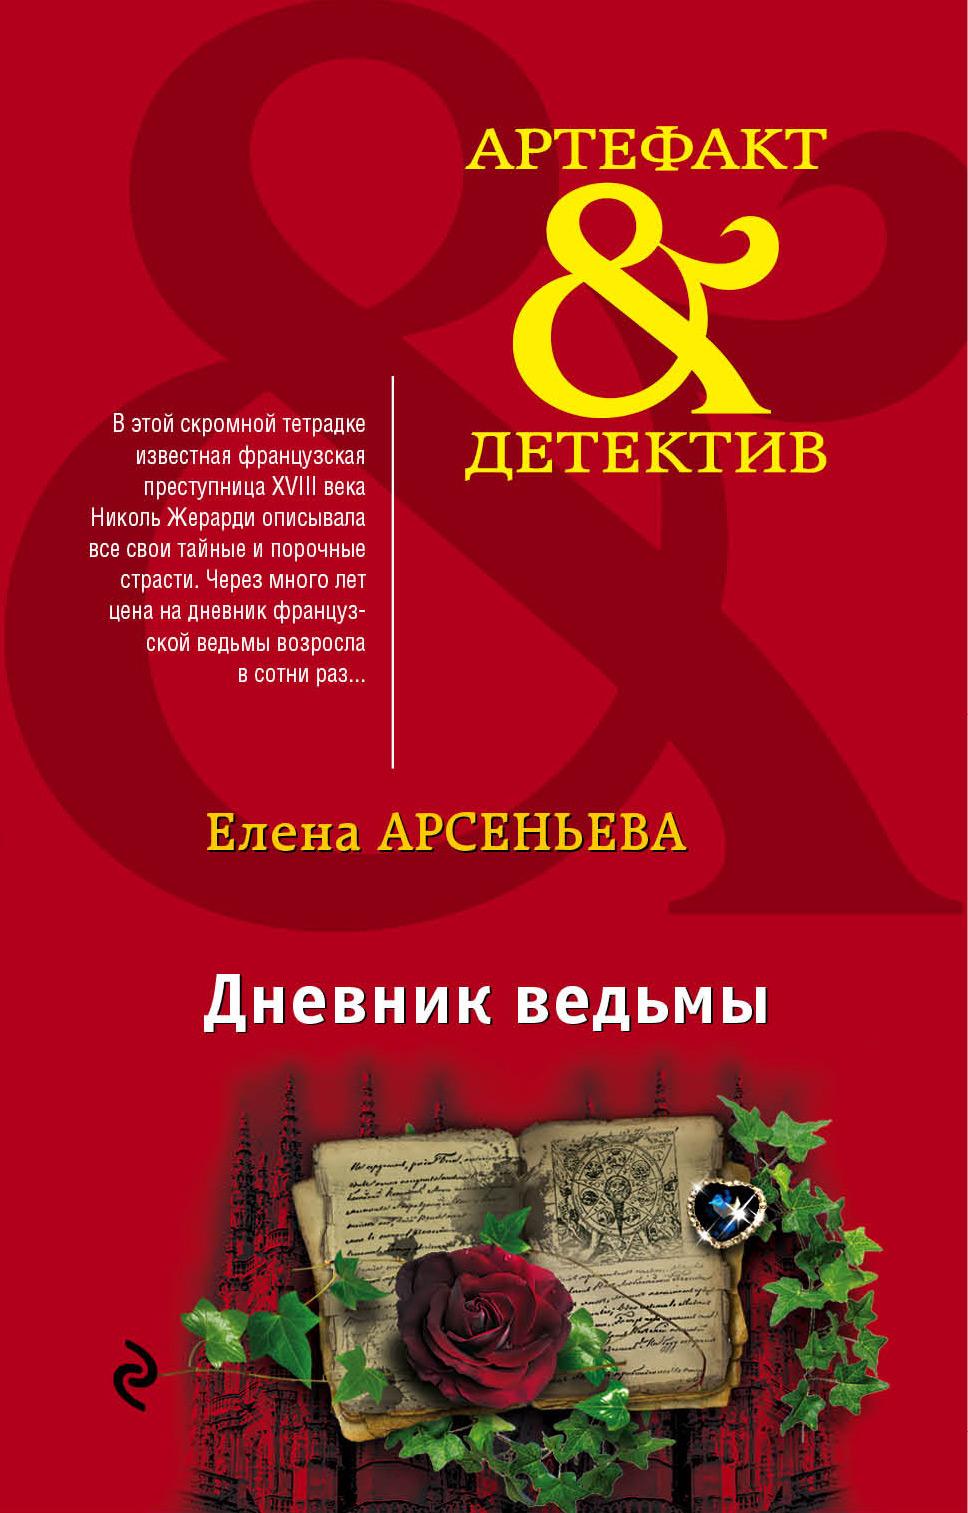 Елена Арсеньева Дневник ведьмы анна радклиф the romance of the forest